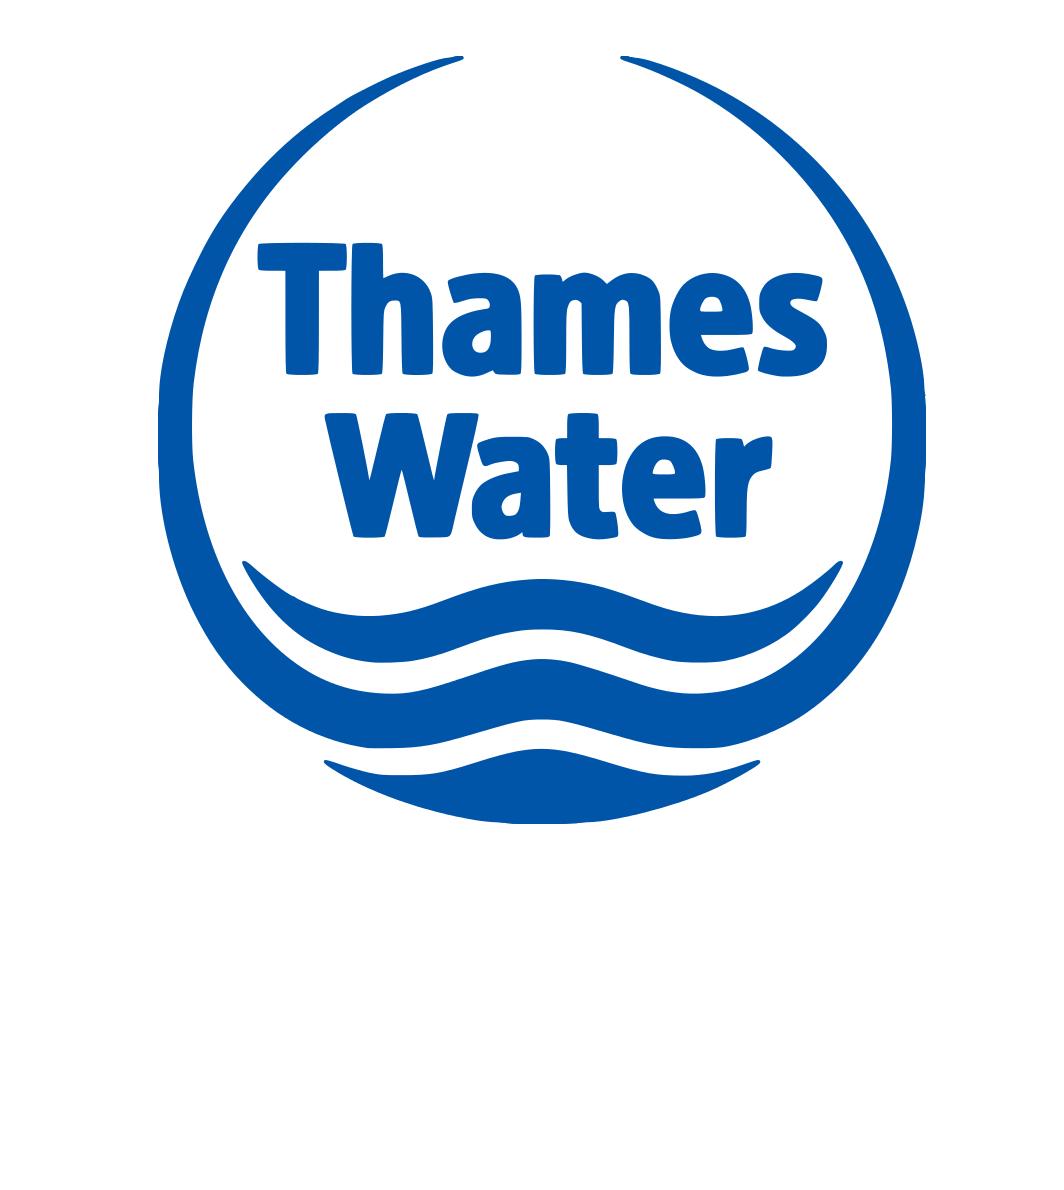 Thames Water Logo Tidefest Partner